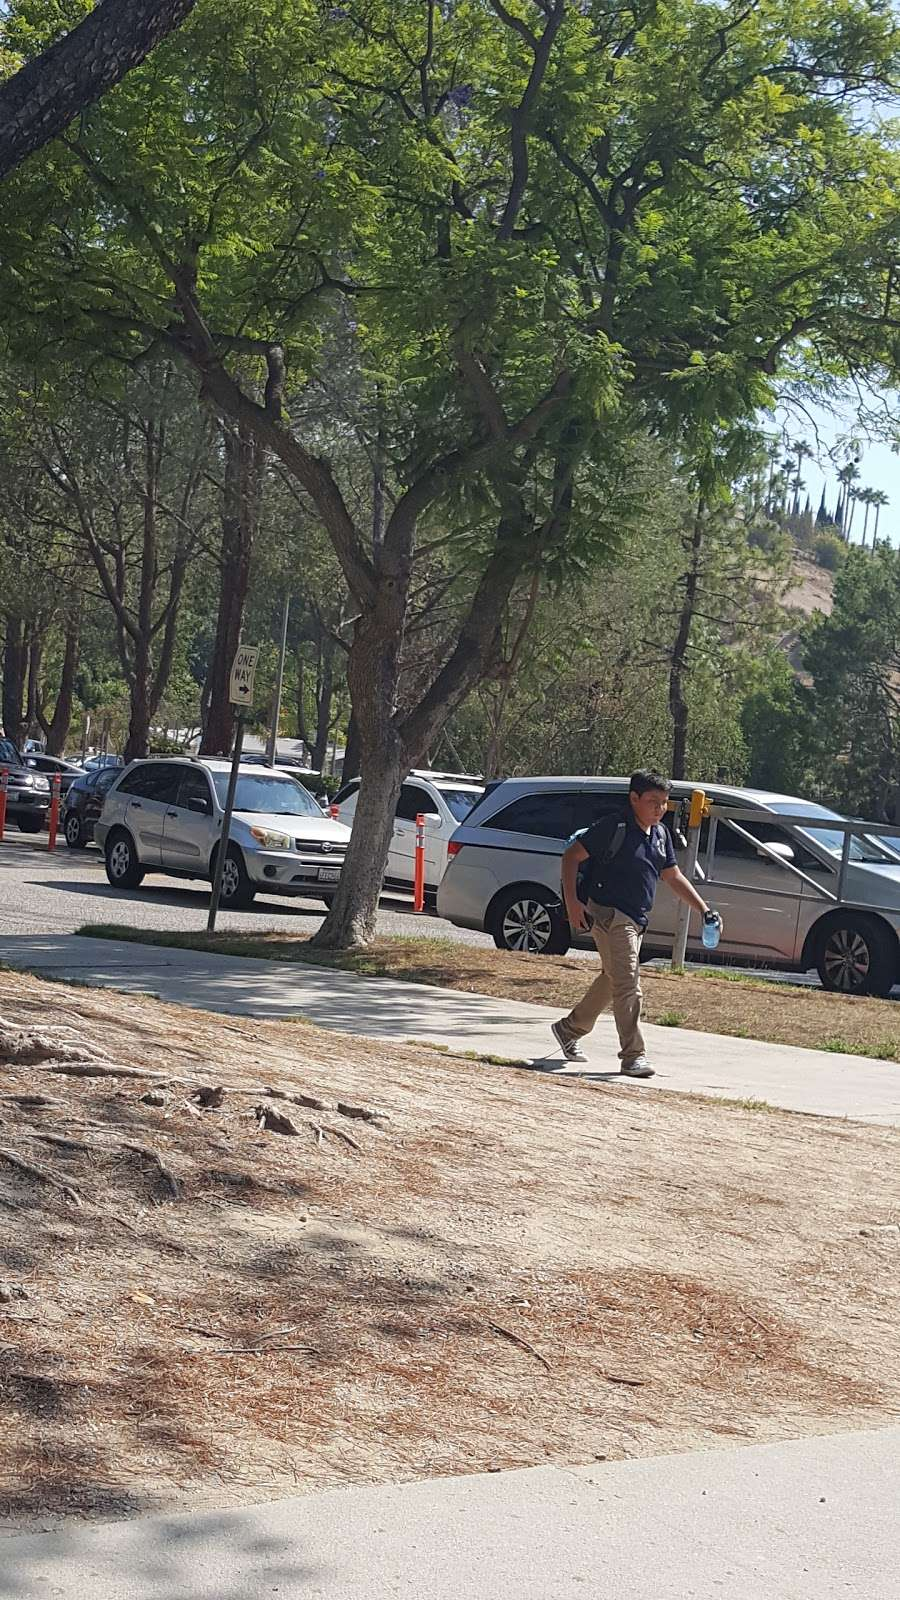 Robert Frost Middle School - school  | Photo 7 of 10 | Address: 12314 Bradford Pl, Granada Hills, CA 91344, USA | Phone: (818) 832-6900